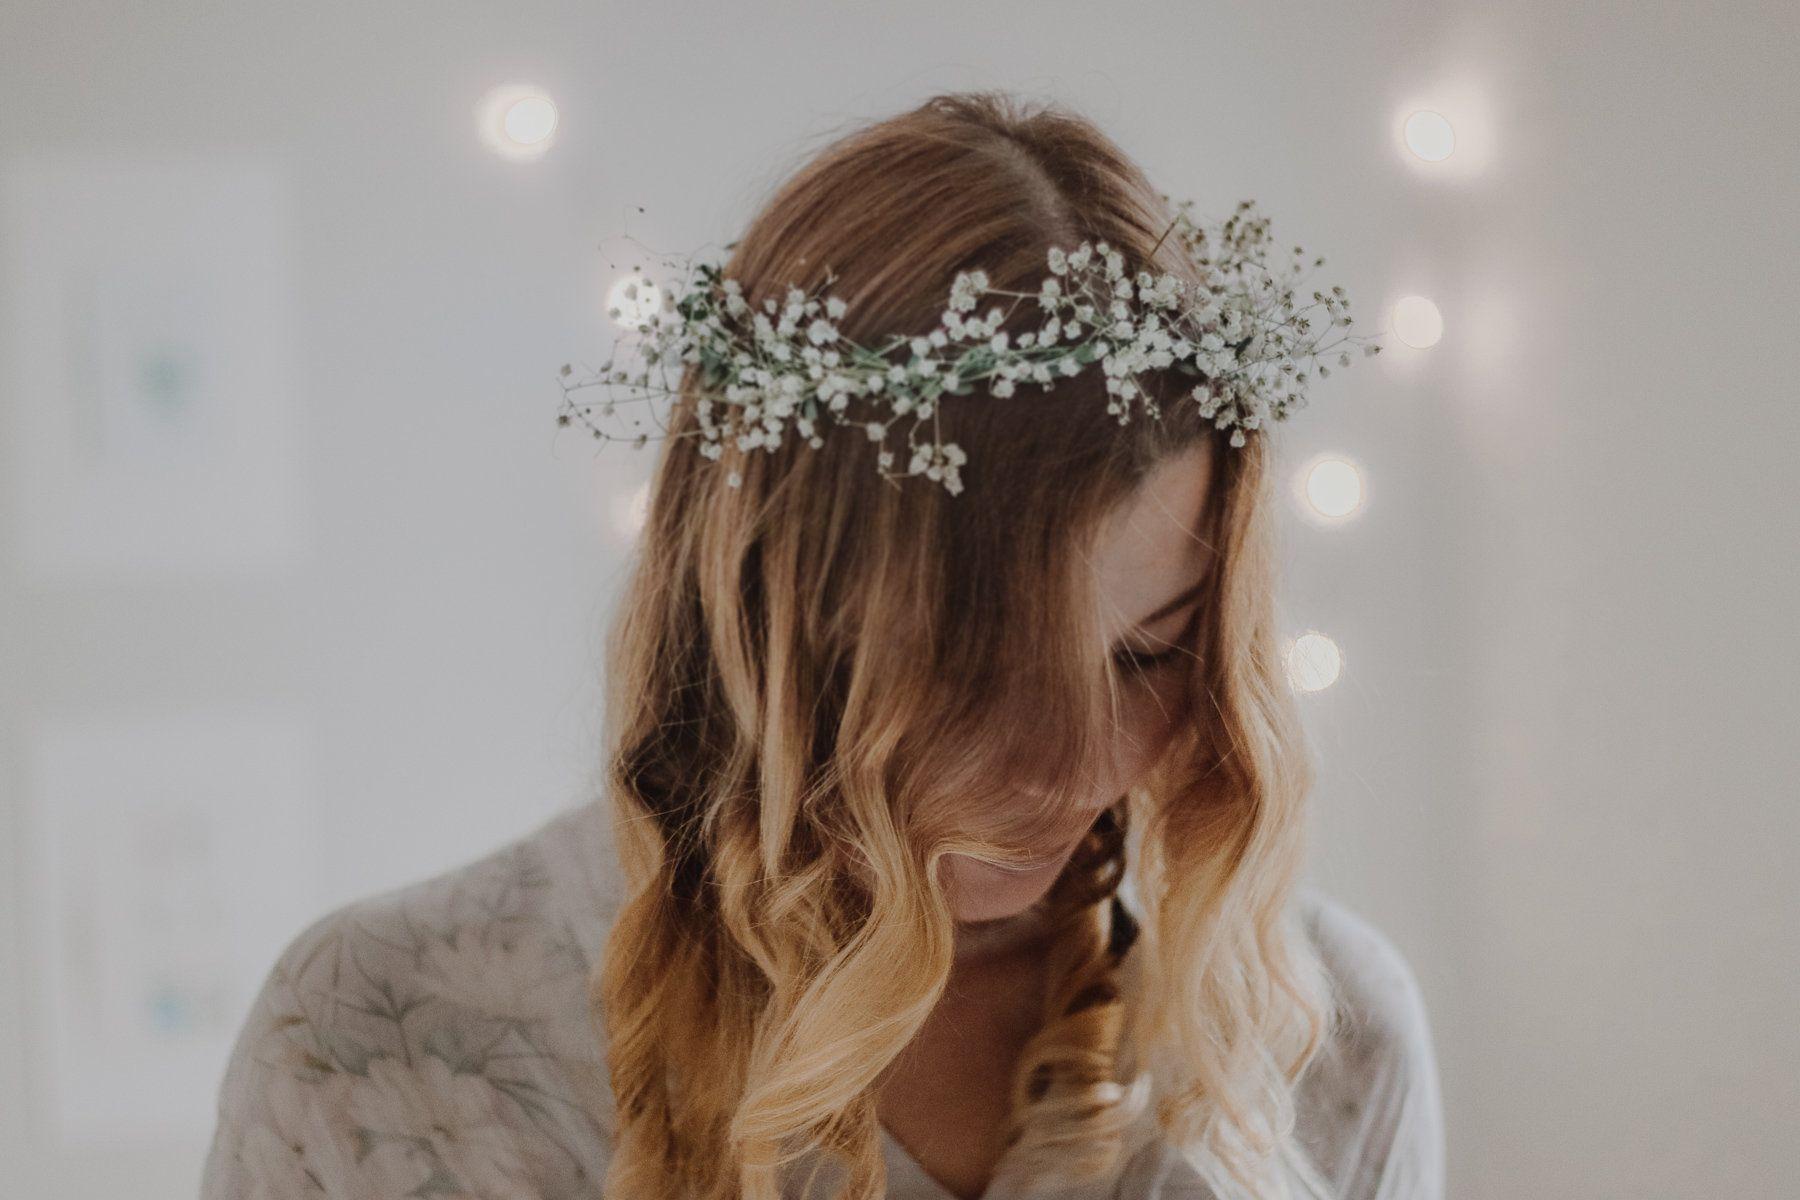 Gypsohila Baby S Breath Dried Flower Crown Bridal Etsy Bridal Crown Bridesmaid Wreath Bridesmaid Flowers